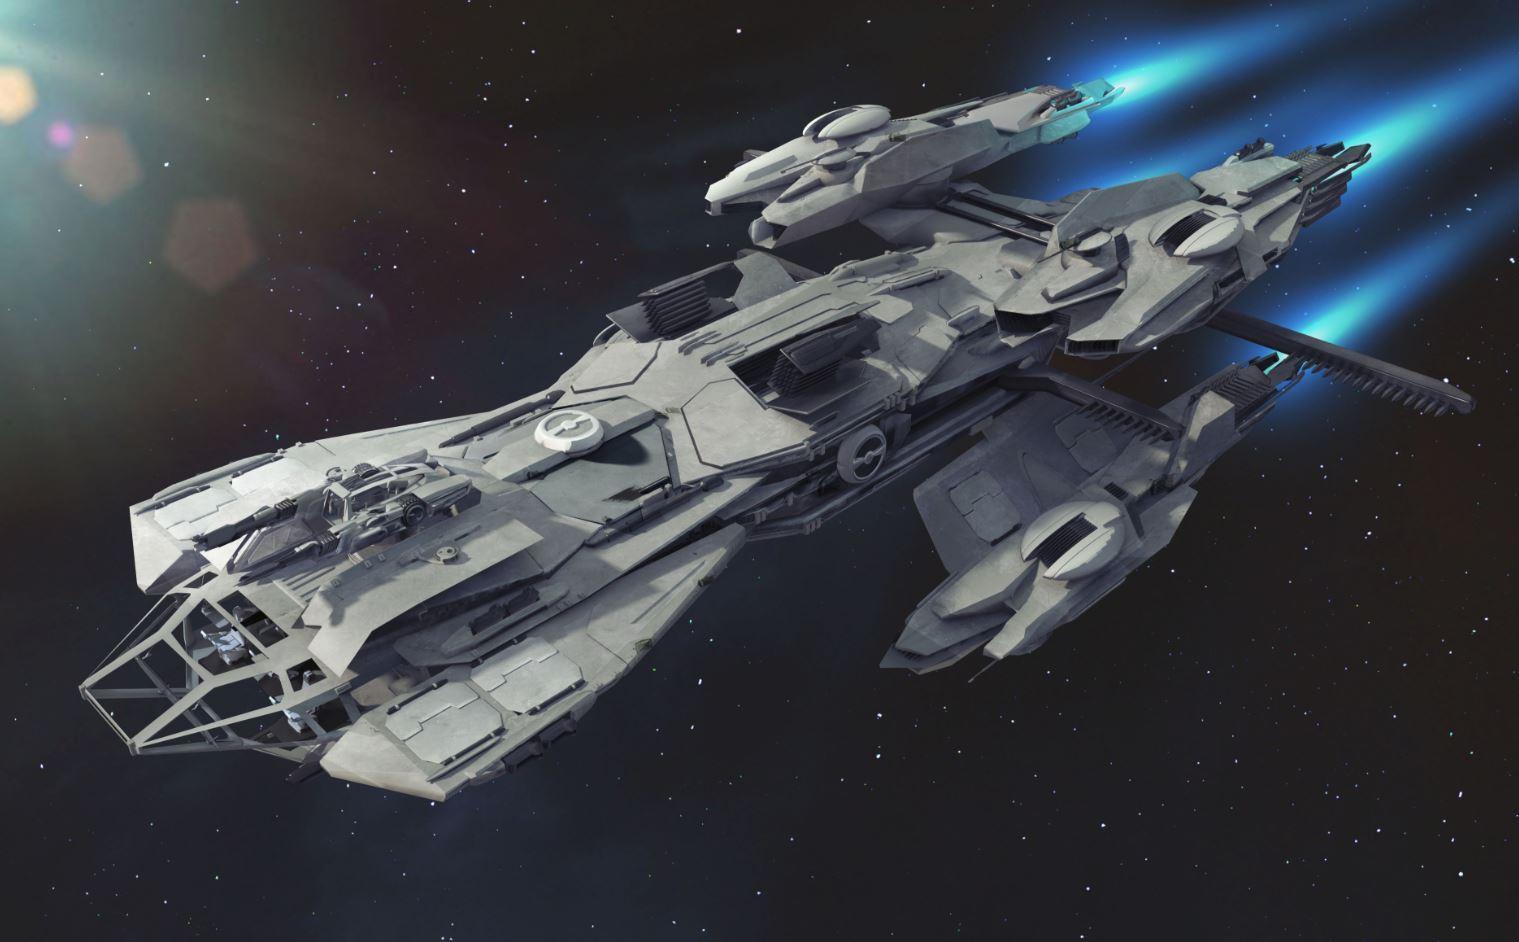 Star citizen ships